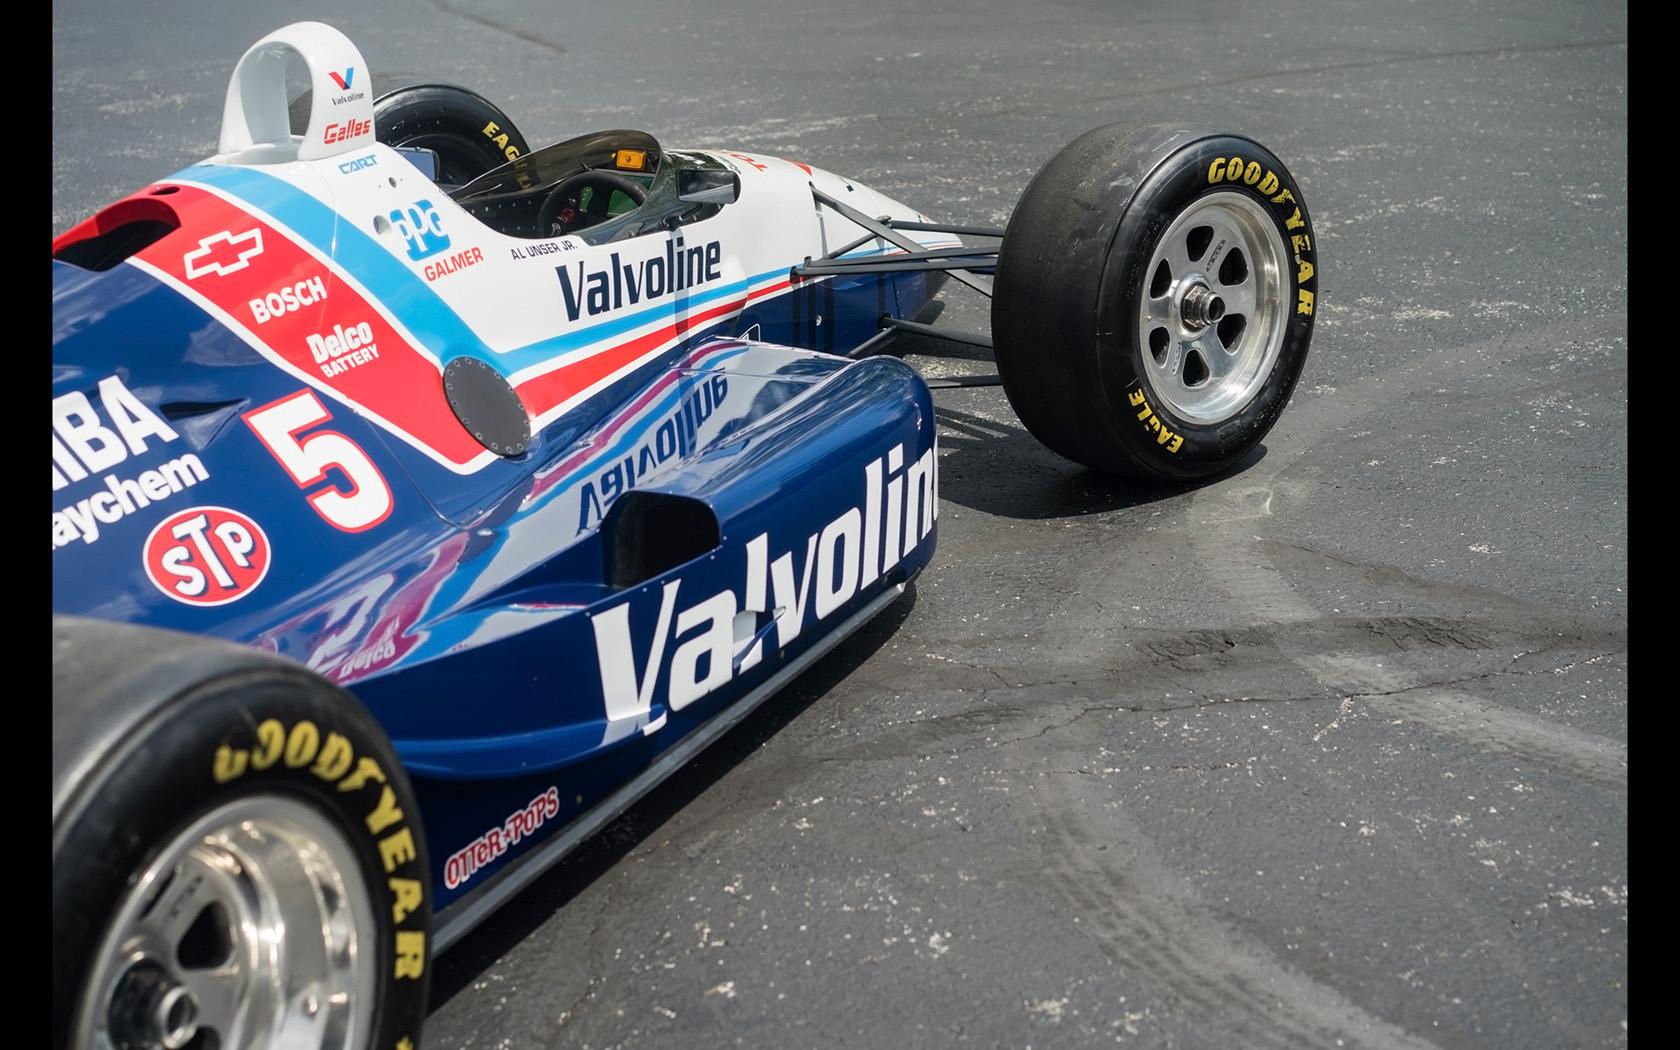 1990 Lola T9000 Valvoline Indy Car   Details   3   1680x1050 1680x1050